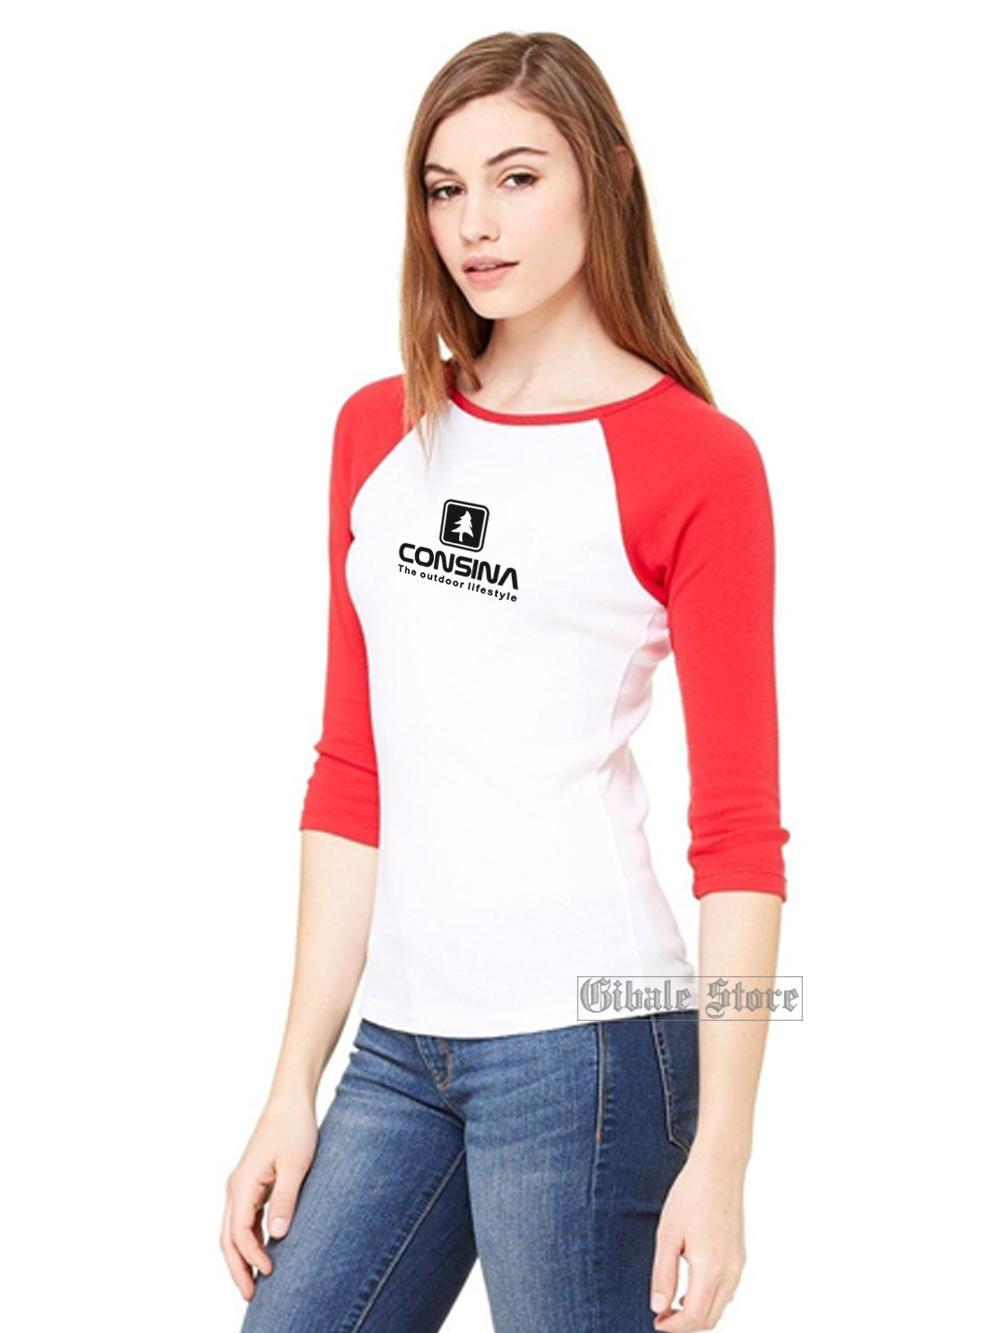 Gibale Store - Kaos Polos Wanita / Kaos Raglan / Kaos Olahraga - Consina Outdoor Style / Kaos Warna Hitam - Biru Dongker - Marun - Putih